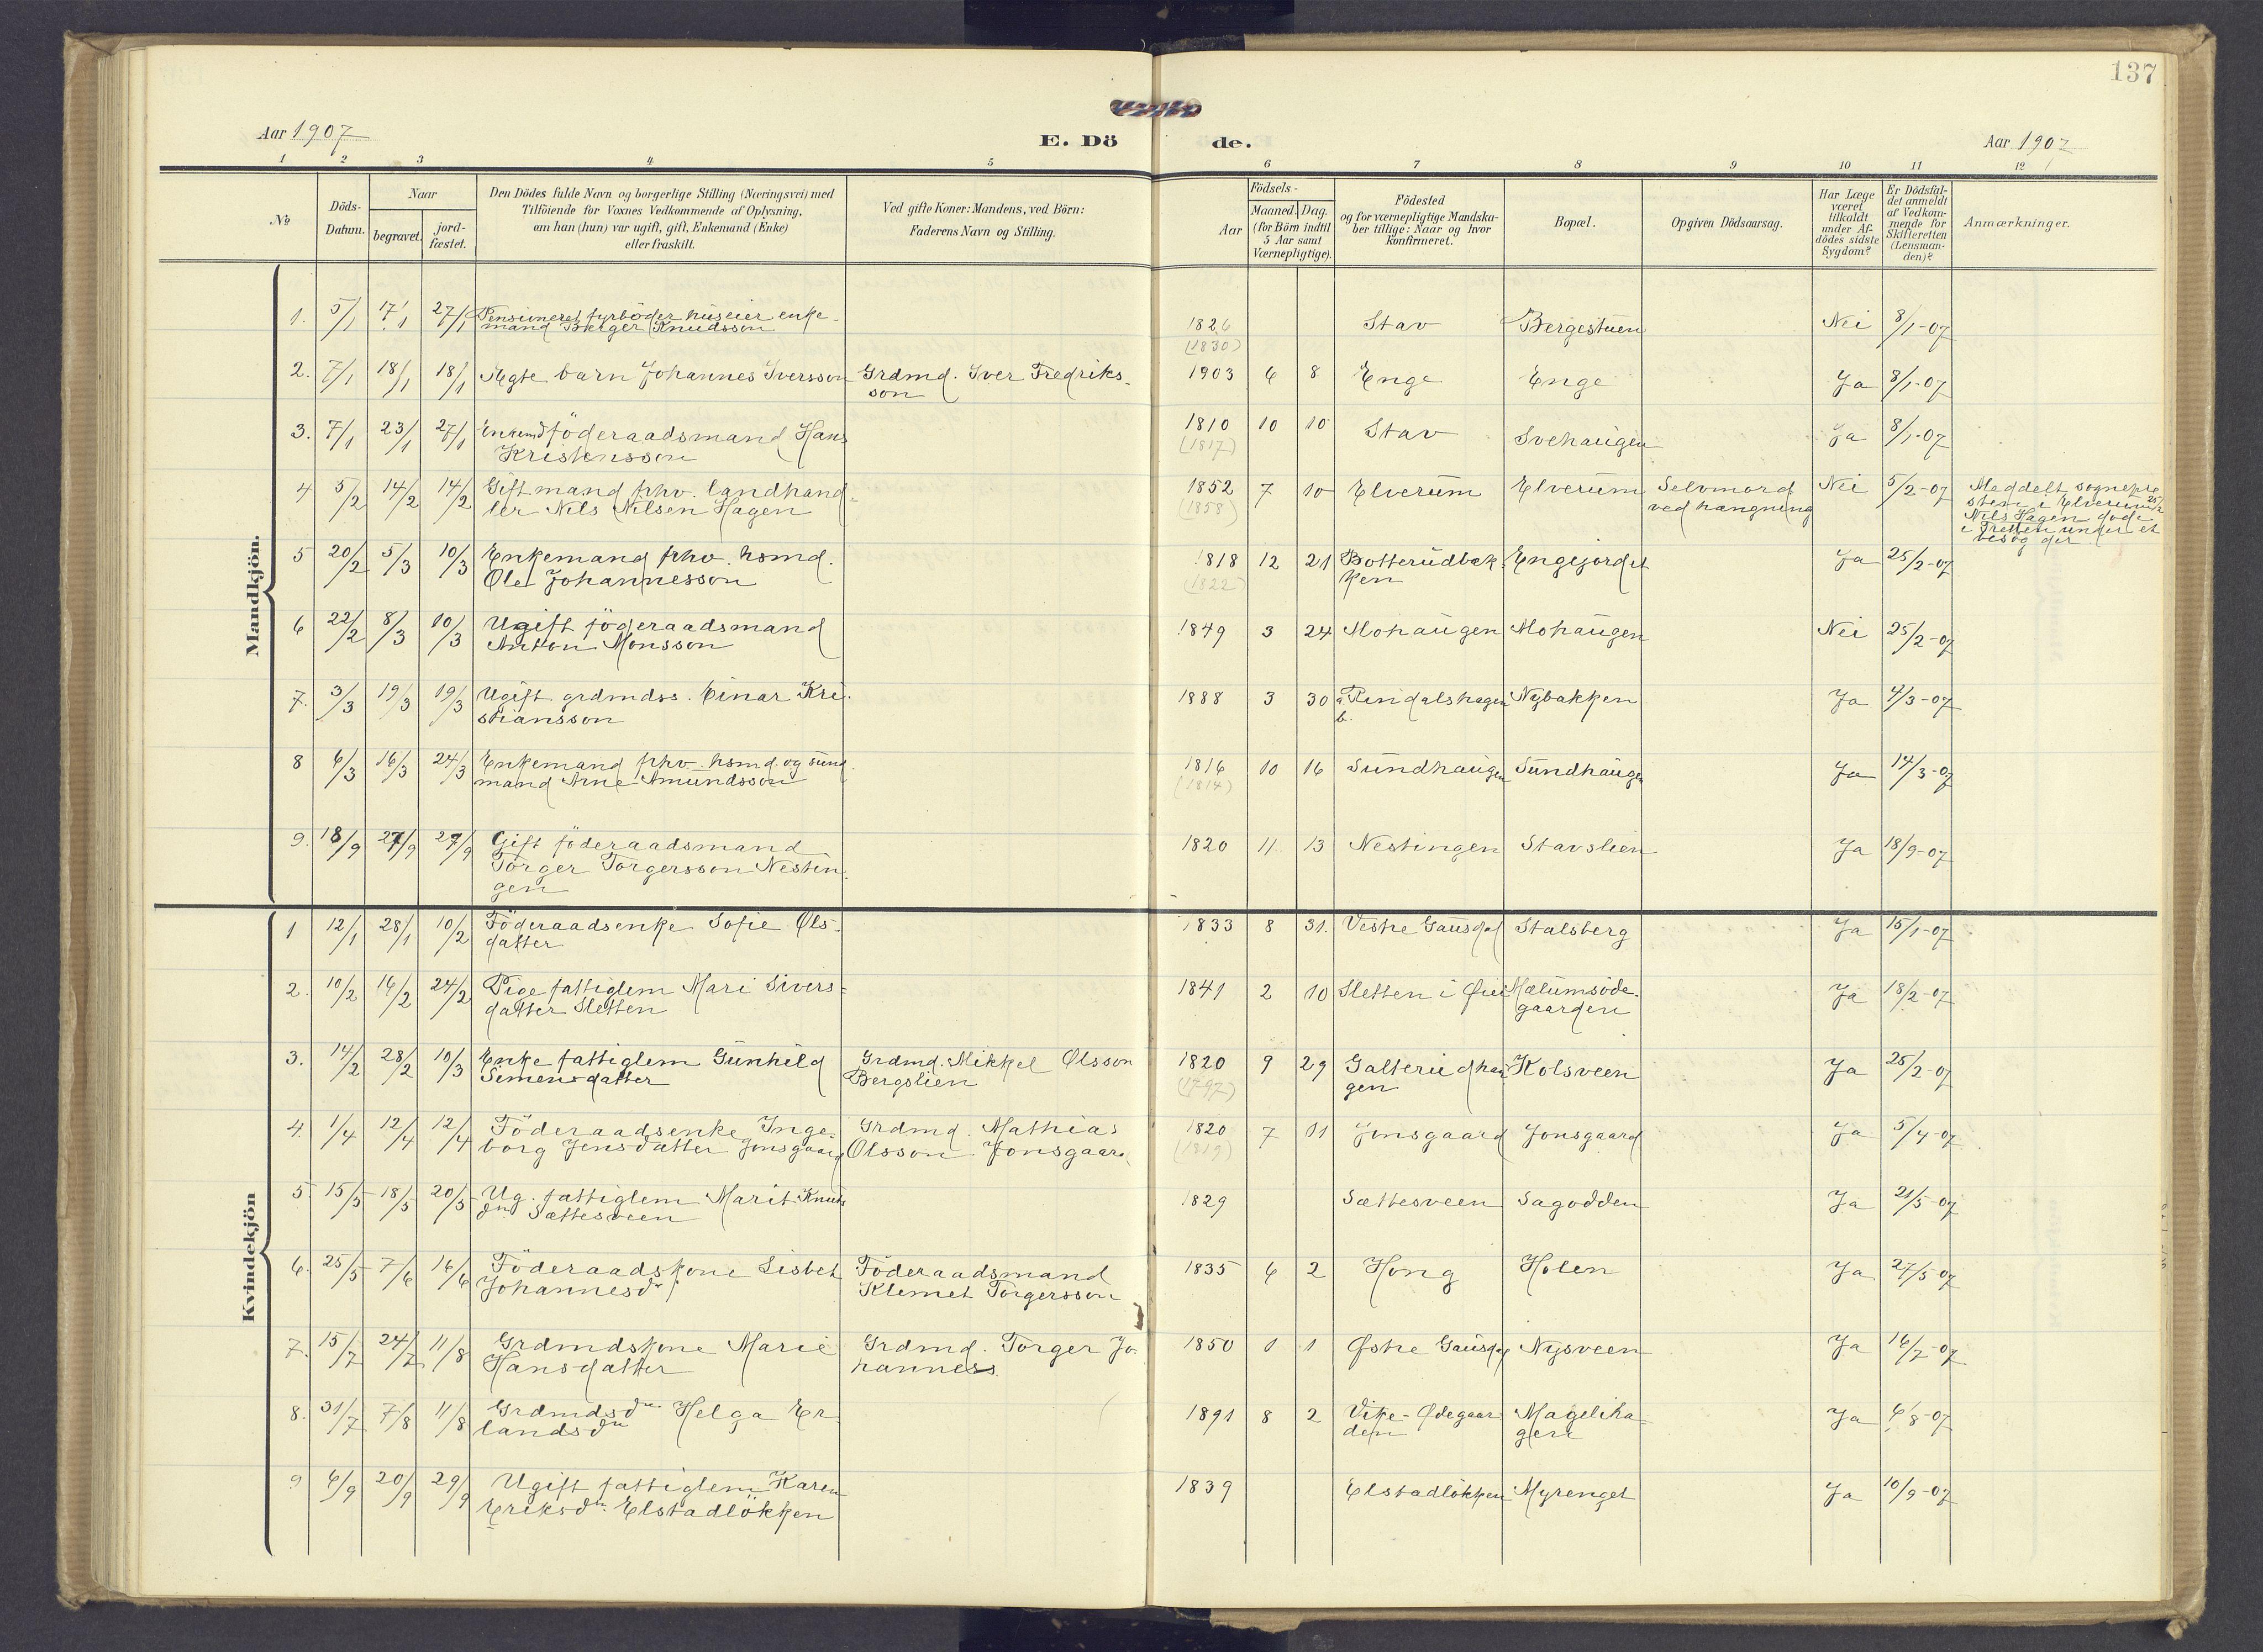 SAH, Øyer prestekontor, Ministerialbok nr. 13, 1905-1920, s. 137